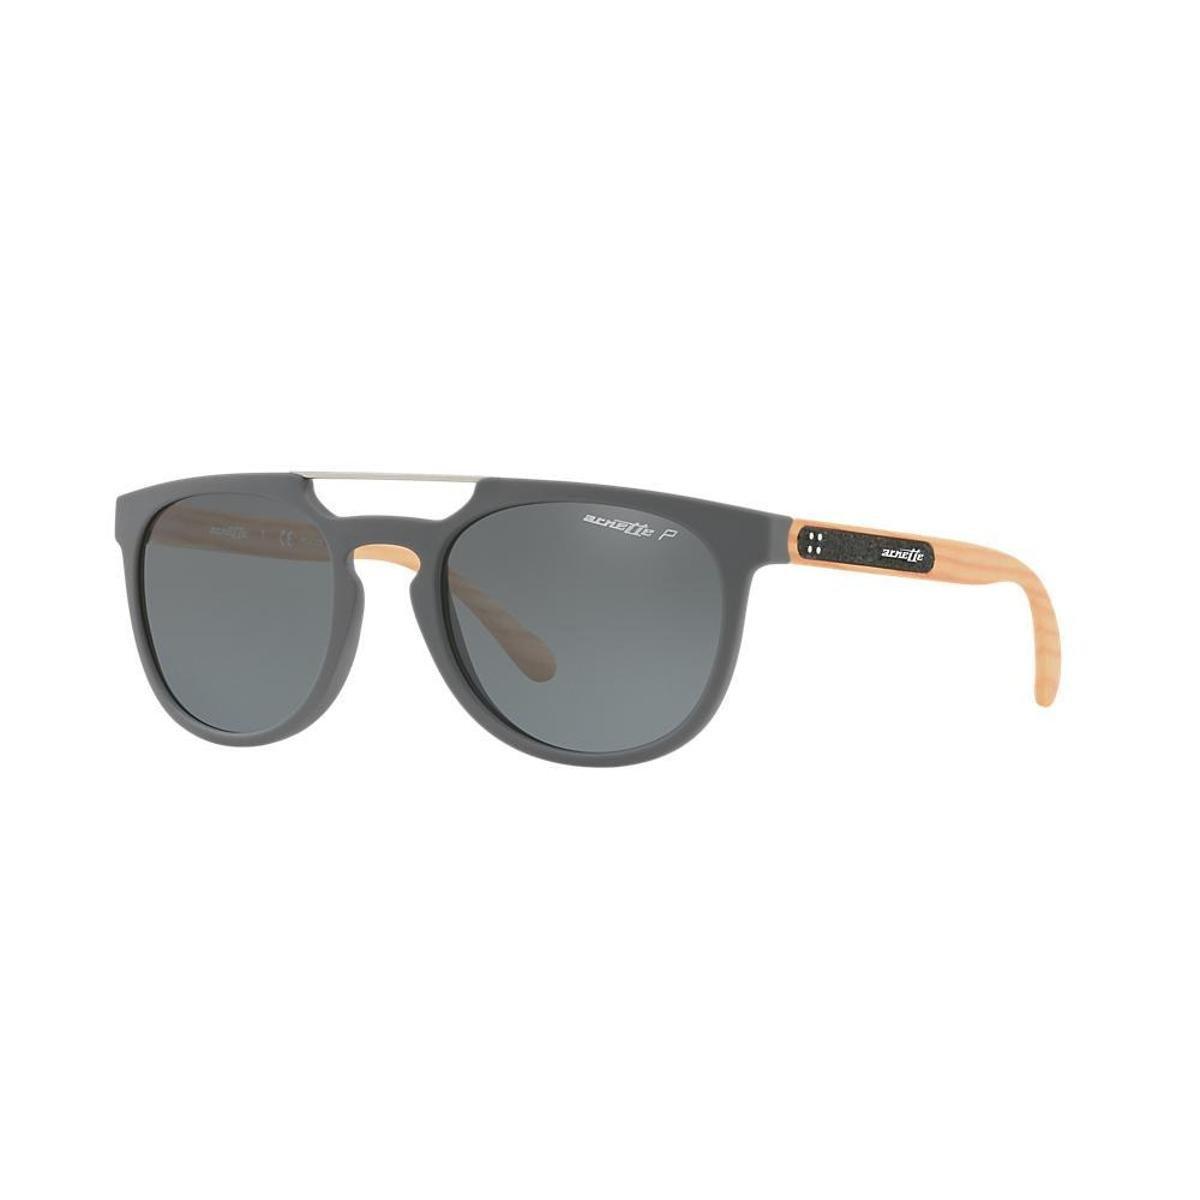 Óculos de Sol Arnette Retangular DG2164 Masculino - Cinza - Compre ... 9f7f18db09